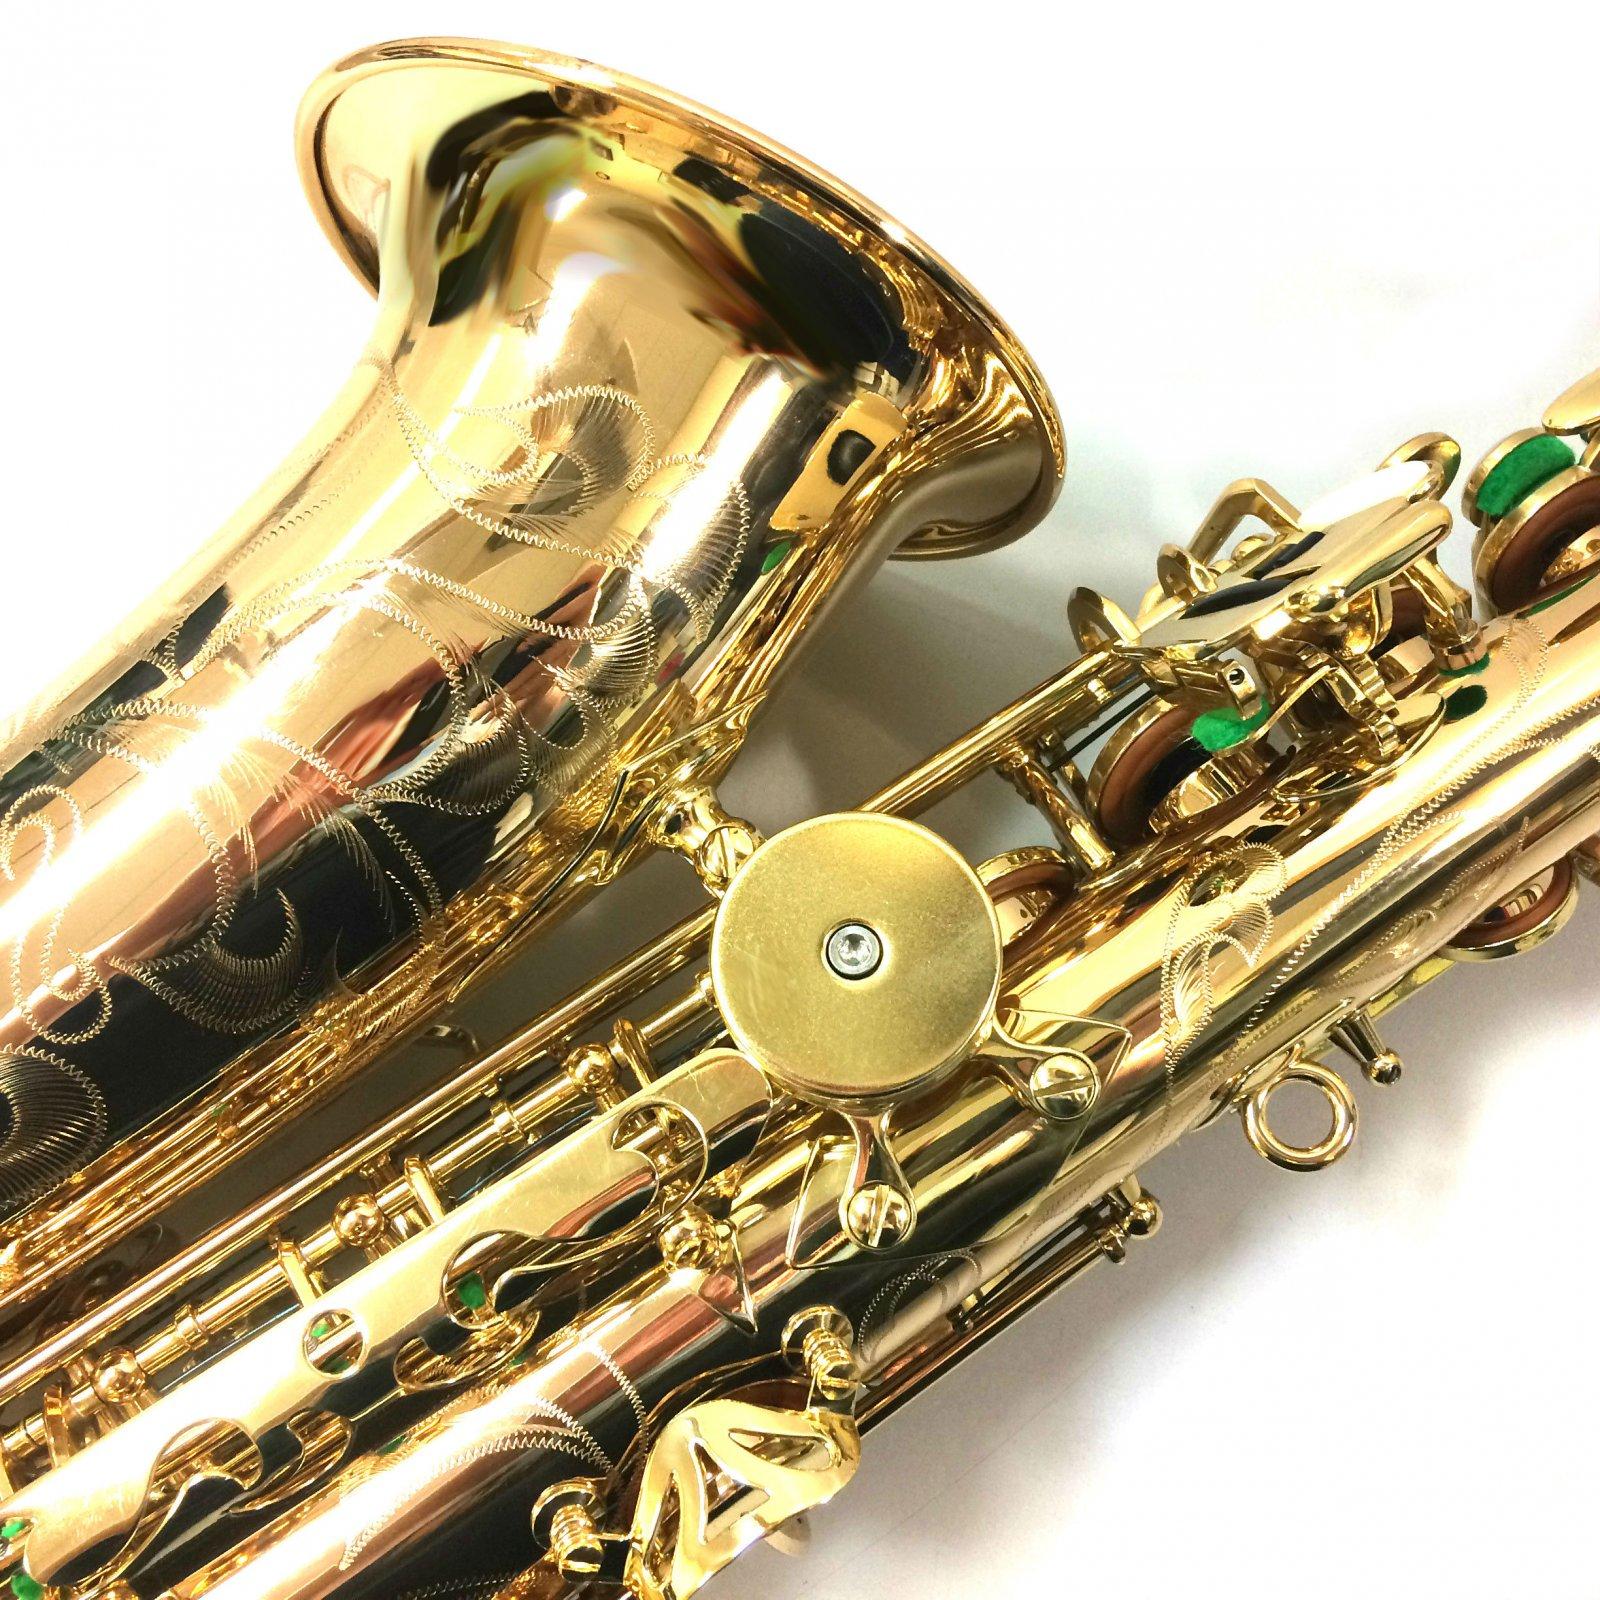 Center Brace Resonance Weights for Selmer Saxophones